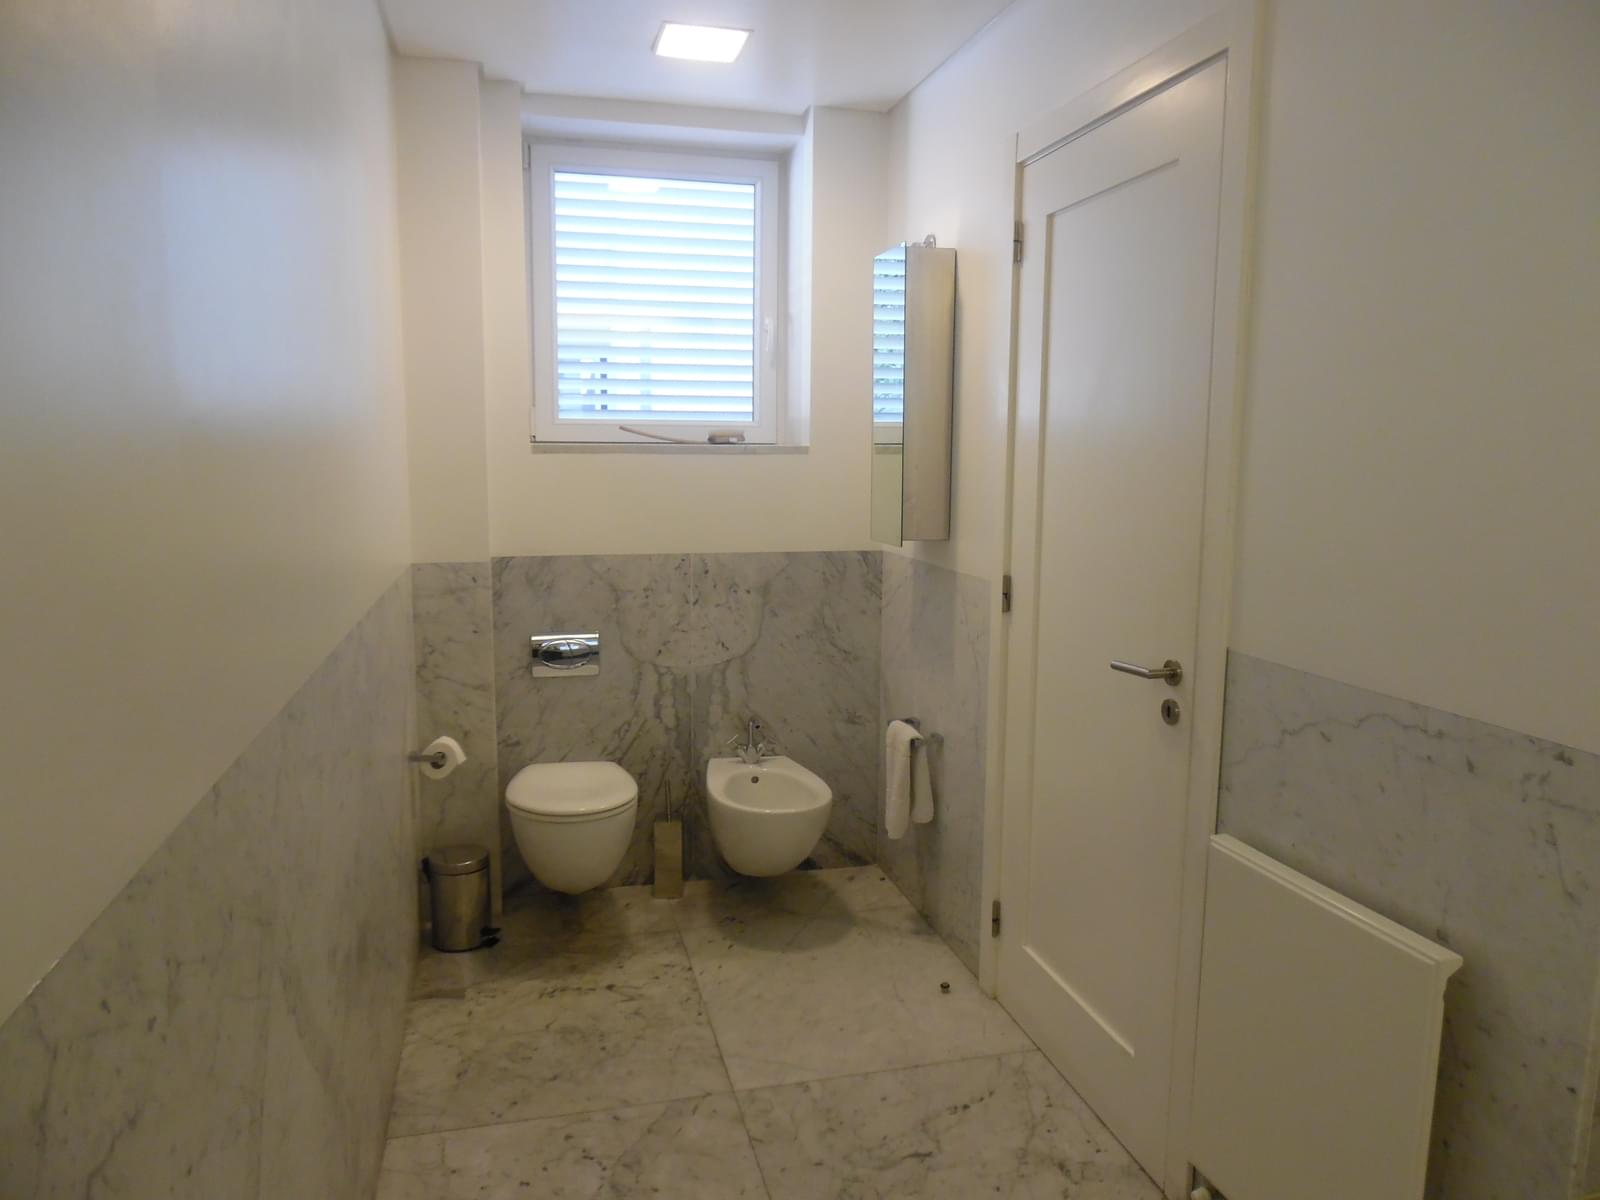 pf17454-apartamento-t4-lisboa-cda37e5c-5918-4766-a1a5-b9615b2ed60b